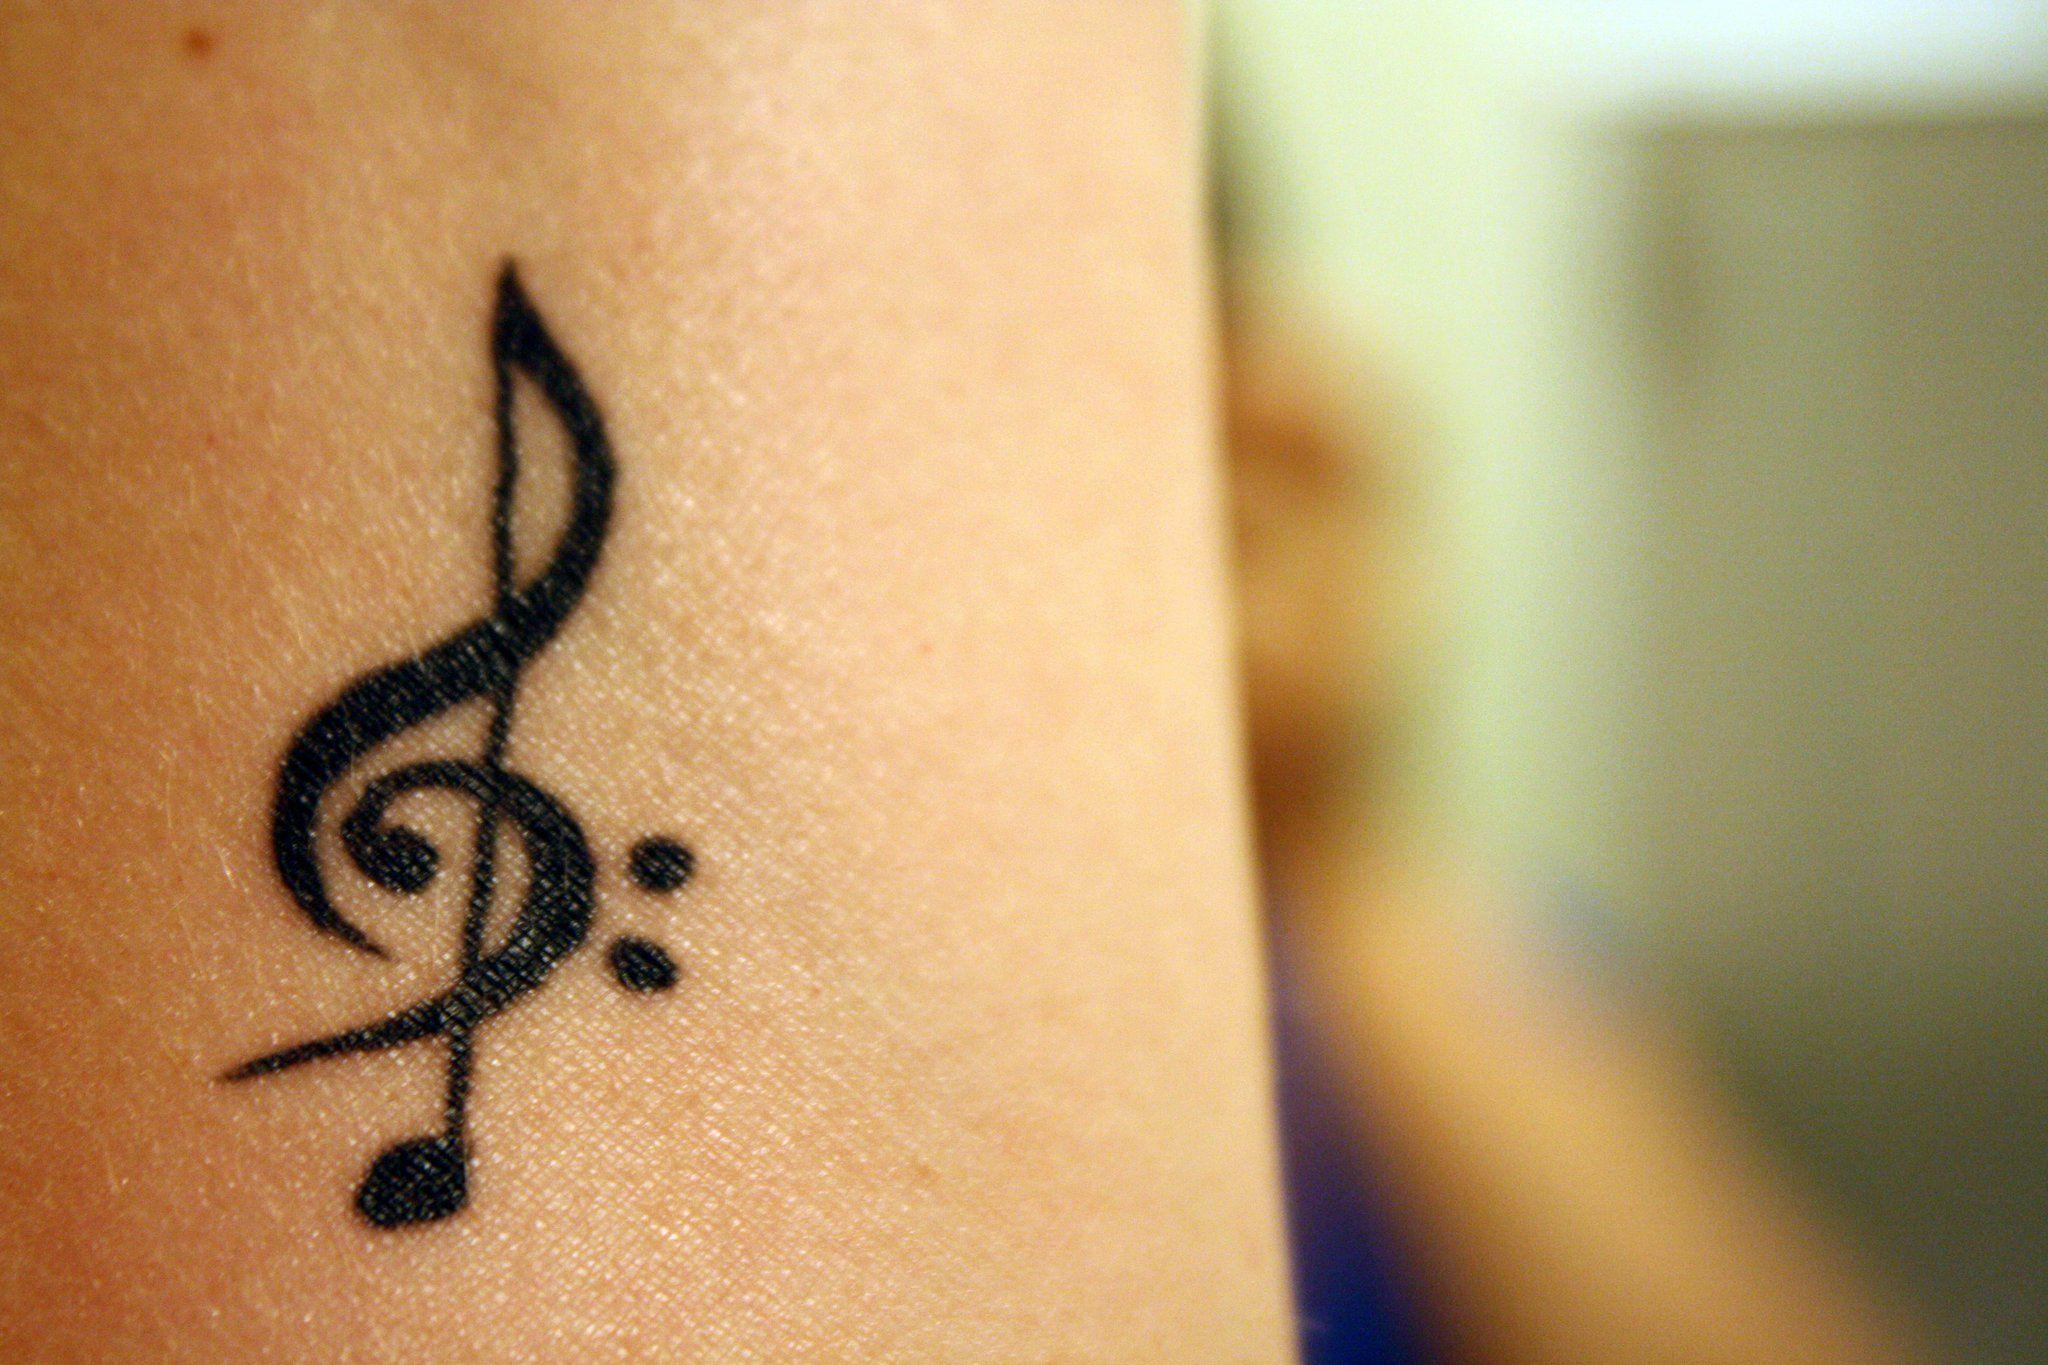 Pin By Marsha Taylor On Tats Pinterest Tattoos Music Tattoos